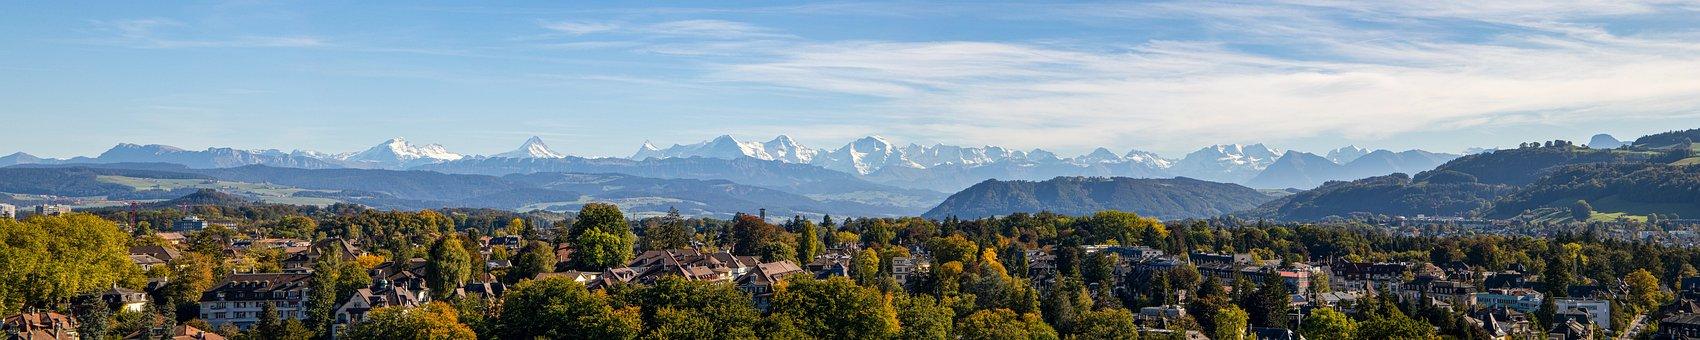 Alpine Panorama, Mountain Range, Alpine